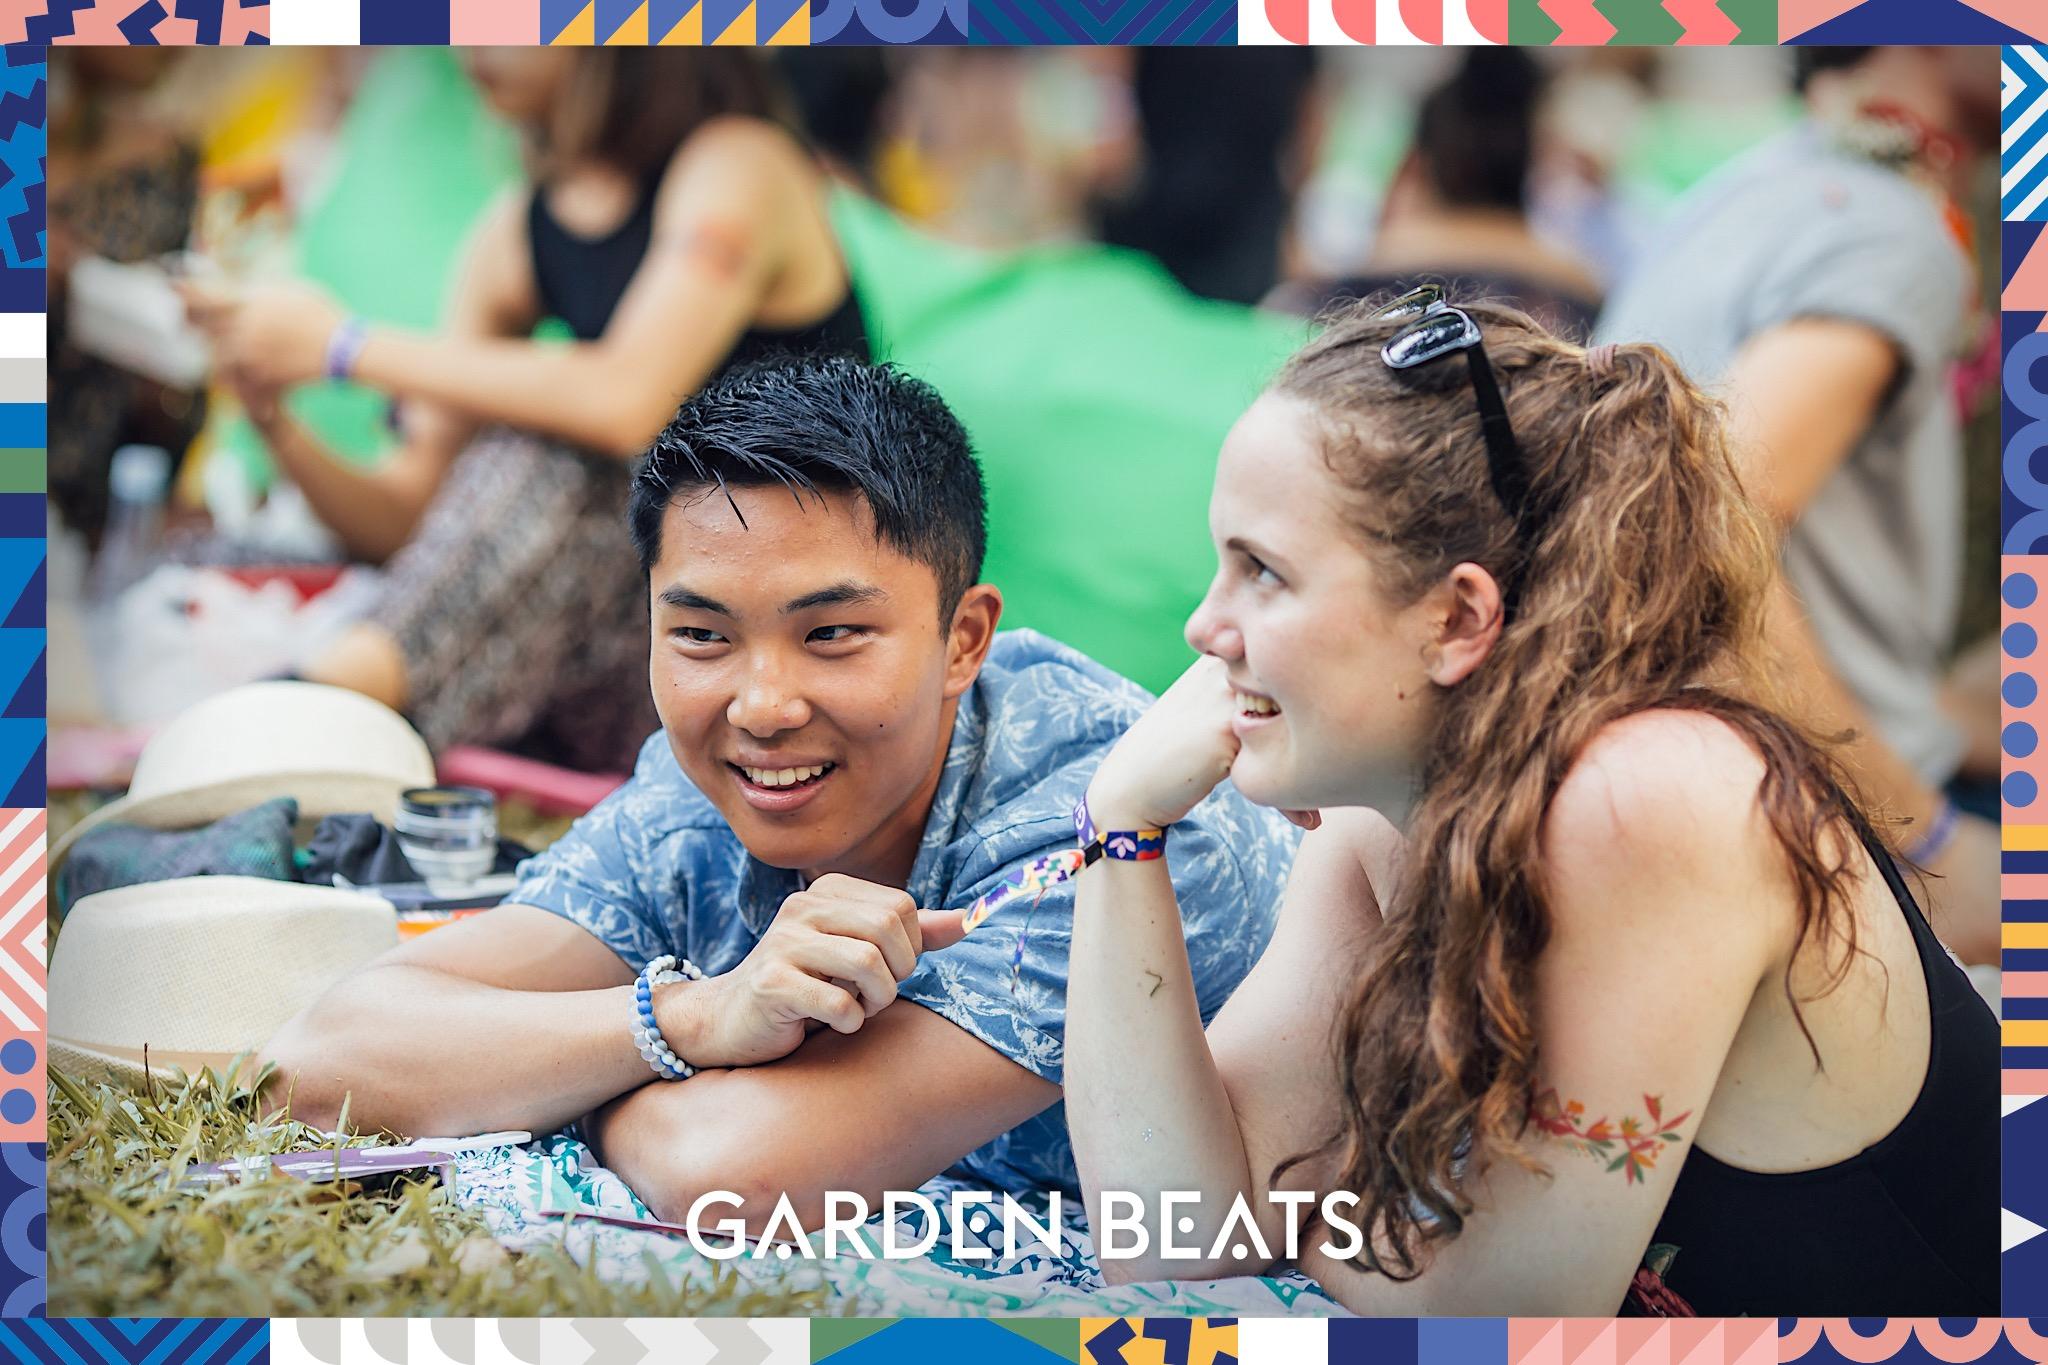 18032017_GardenBeats_Colossal568_WatermarkedGB.jpg